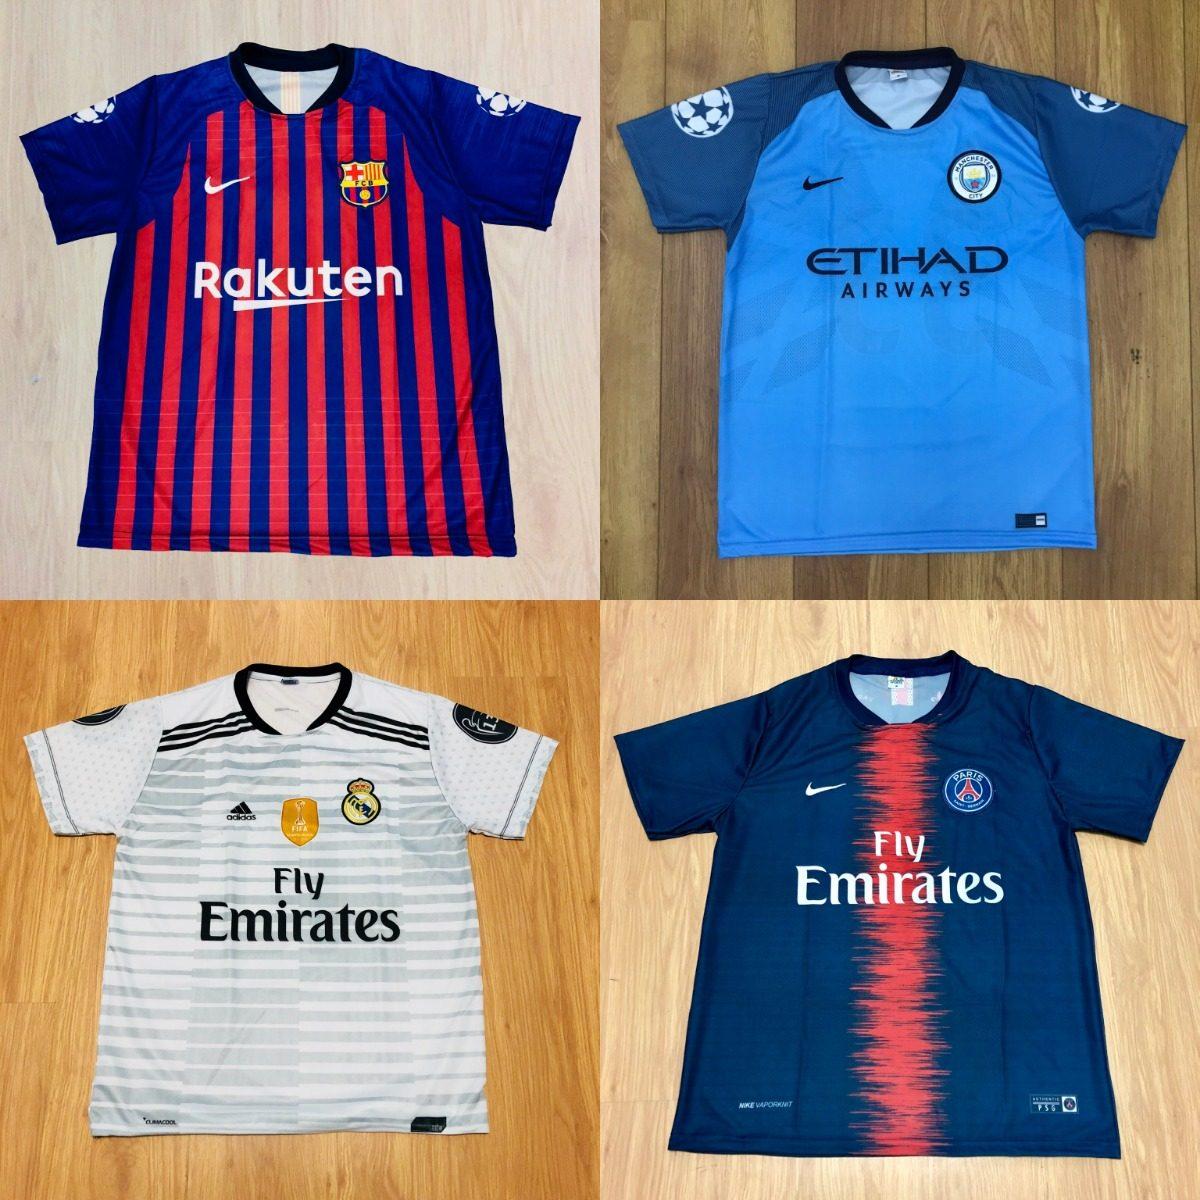 Kit 10 Camisetas De Time Atacado Futebol 100 Modelos 2018 - R  195 ... 2ecbe6c77f949